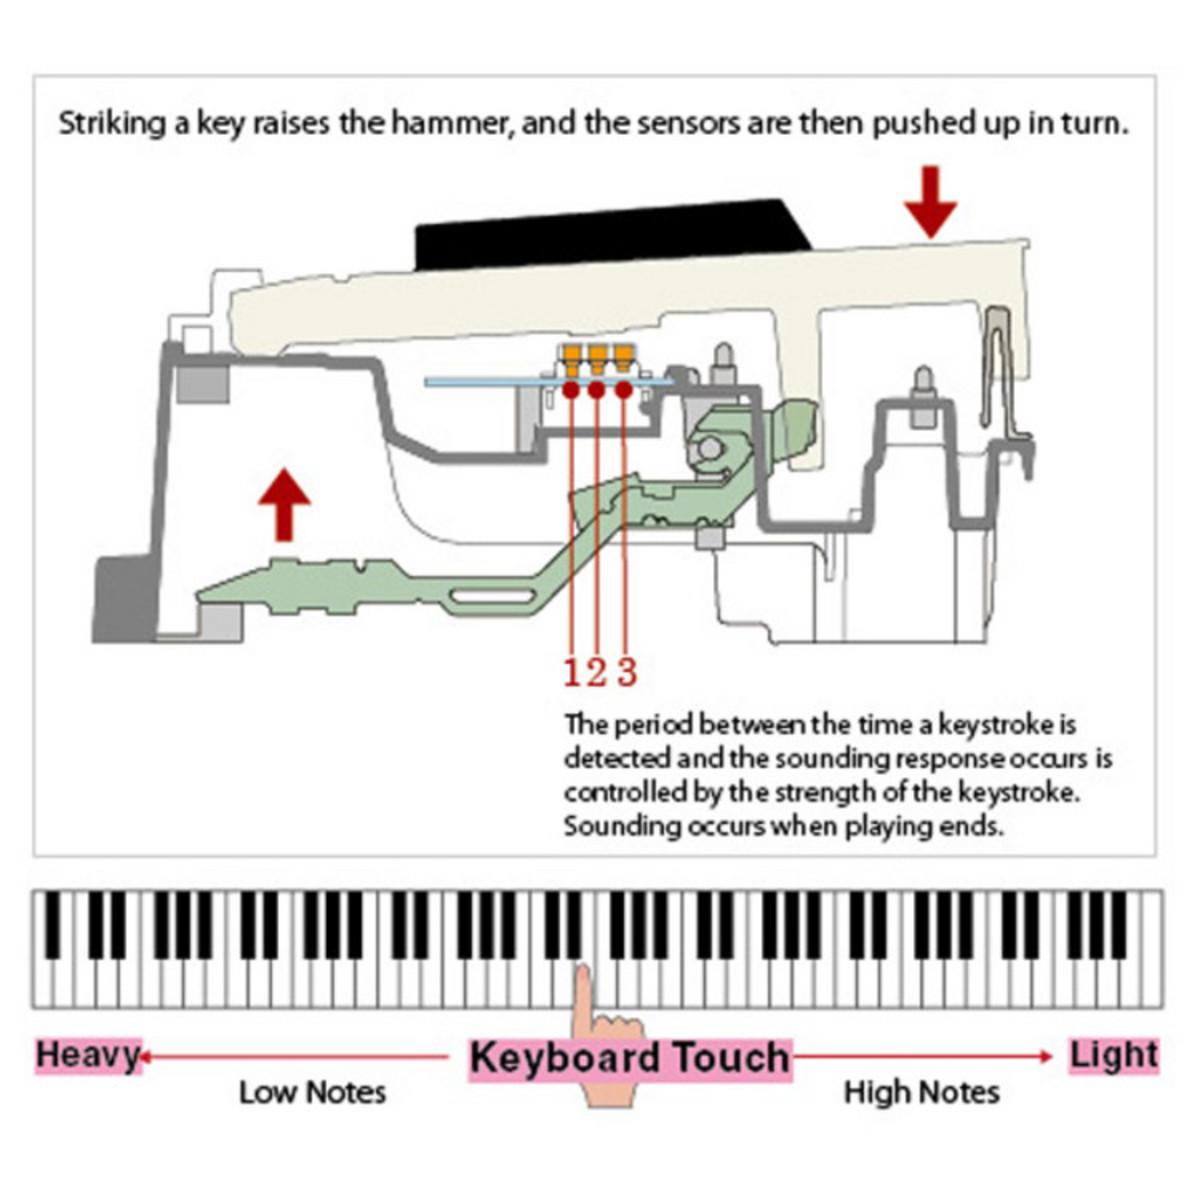 Casio Celviano Ap 650 Digital Piano Box Opened At Gear4music Keyboard Diagram Loading Zoom